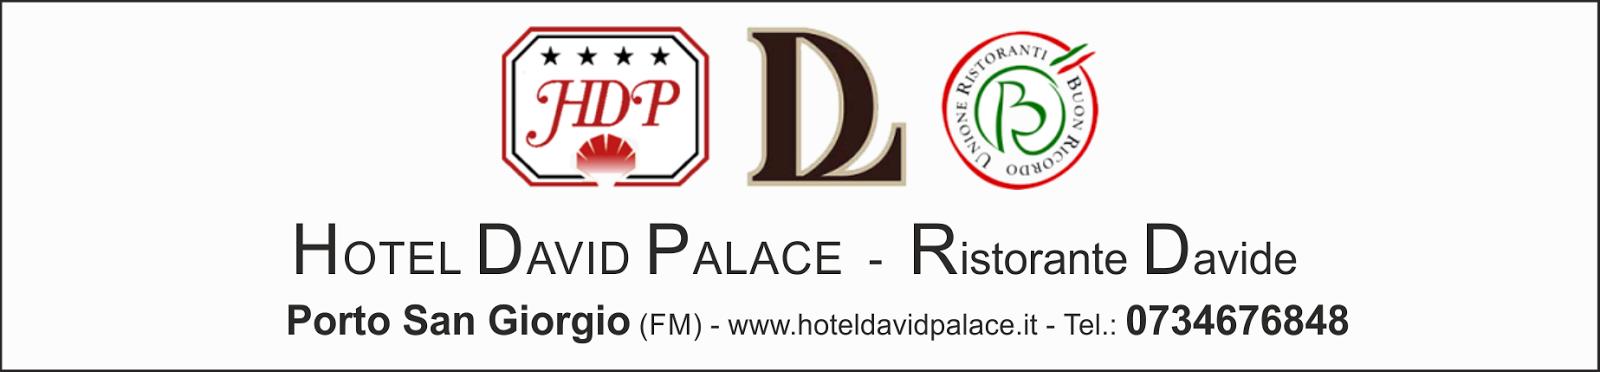 Hotel David Palace - Ristorante Davide